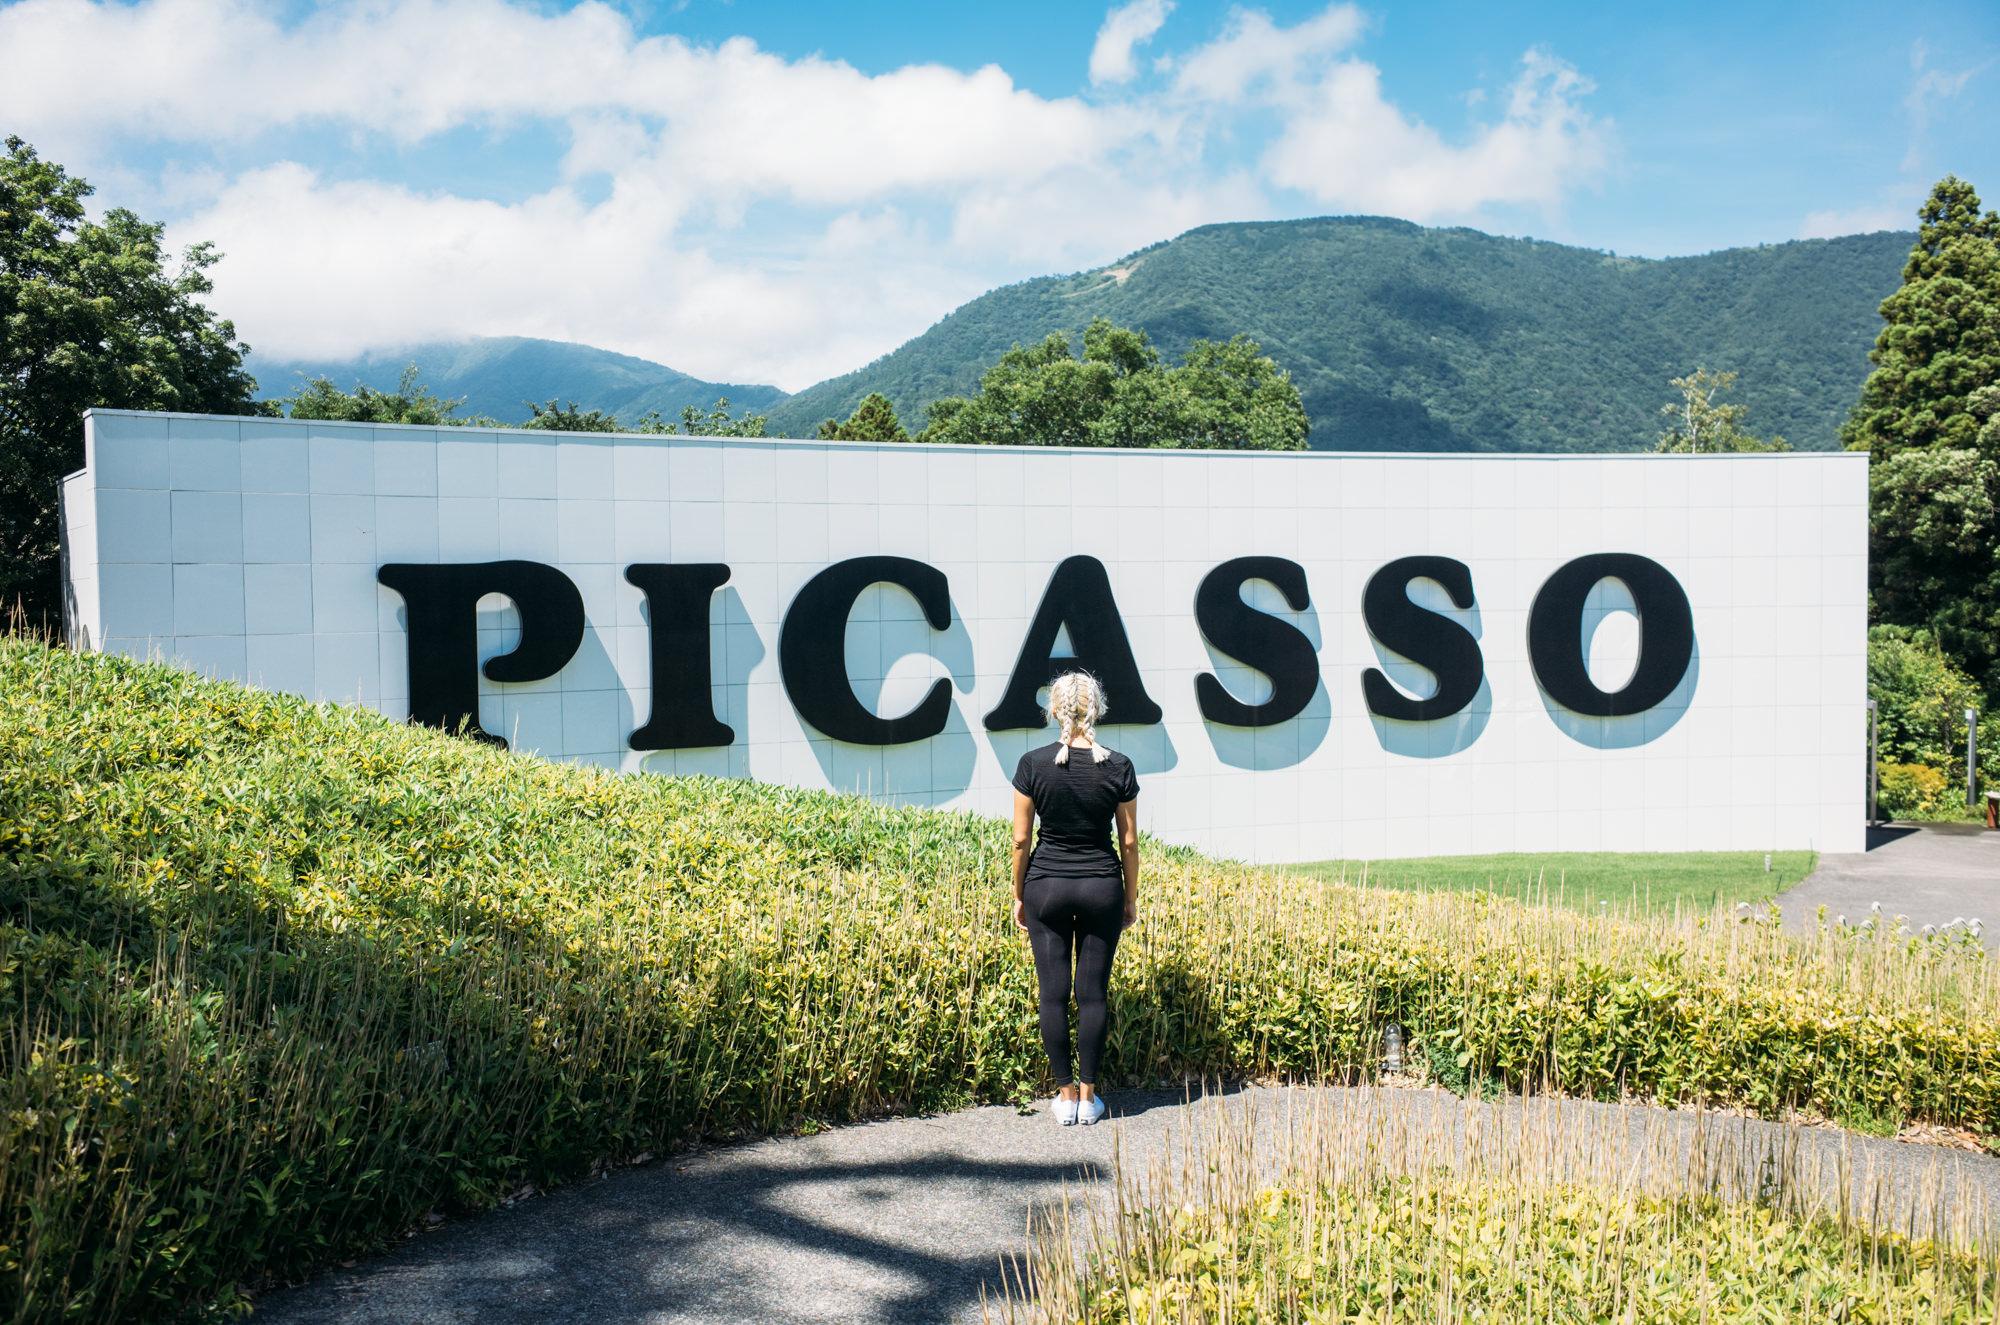 No photos allowed inside the very impressive Picasso Pavillion